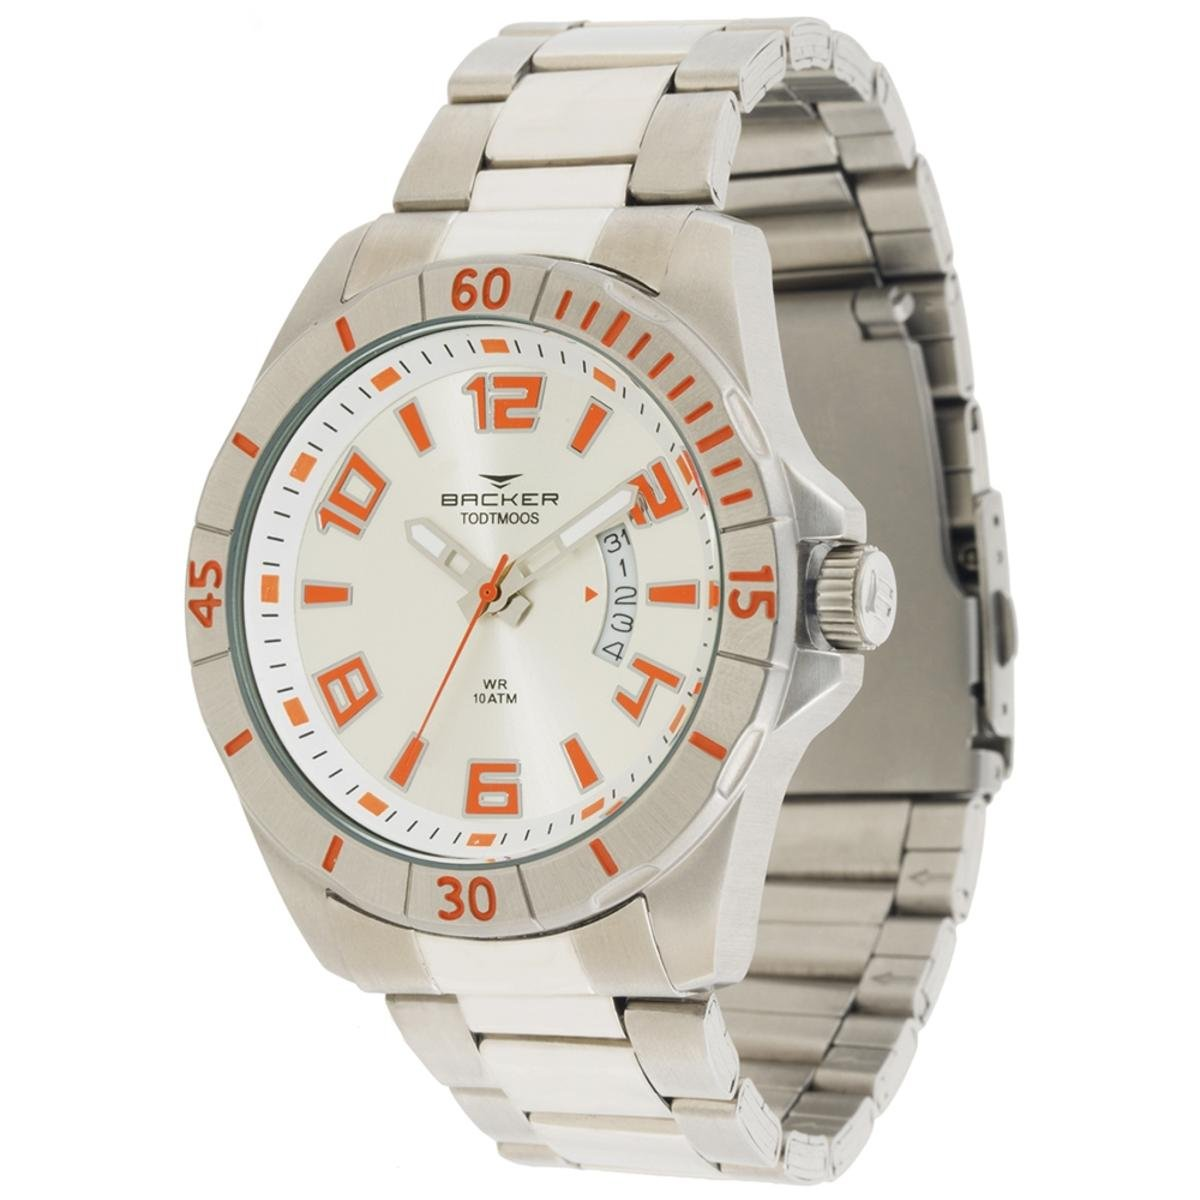 696329c06 Relógio Masculino Backer Analógico 6216253M - Compre Agora | Zattini